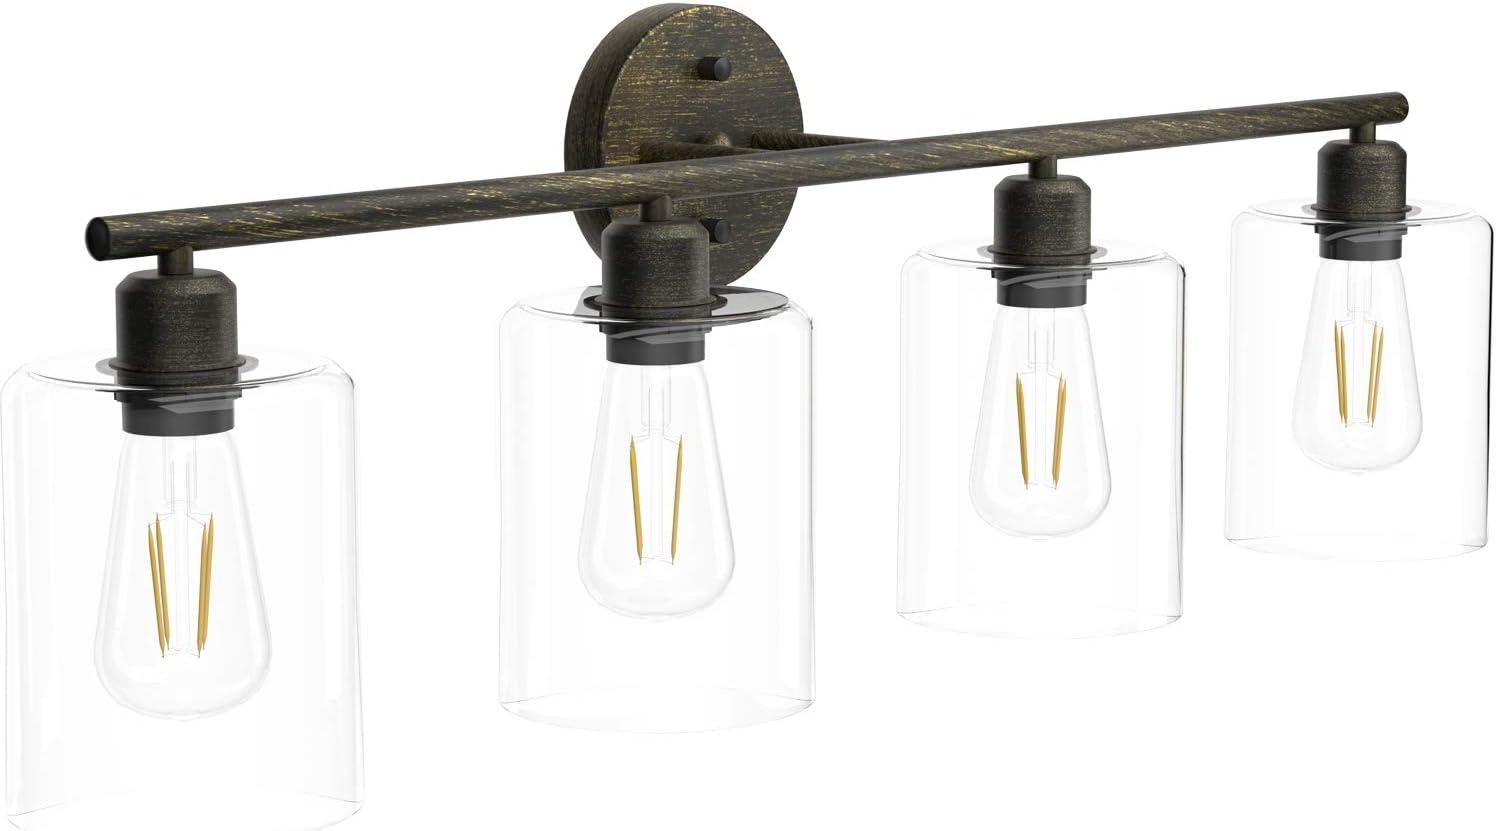 Exclude Bulb Black Vintage Vanity Light Aipsun Bathroom Vanity Lighting Fixtures Industrial Vanity Light for Bathroom Black Wall Light Over Mirror